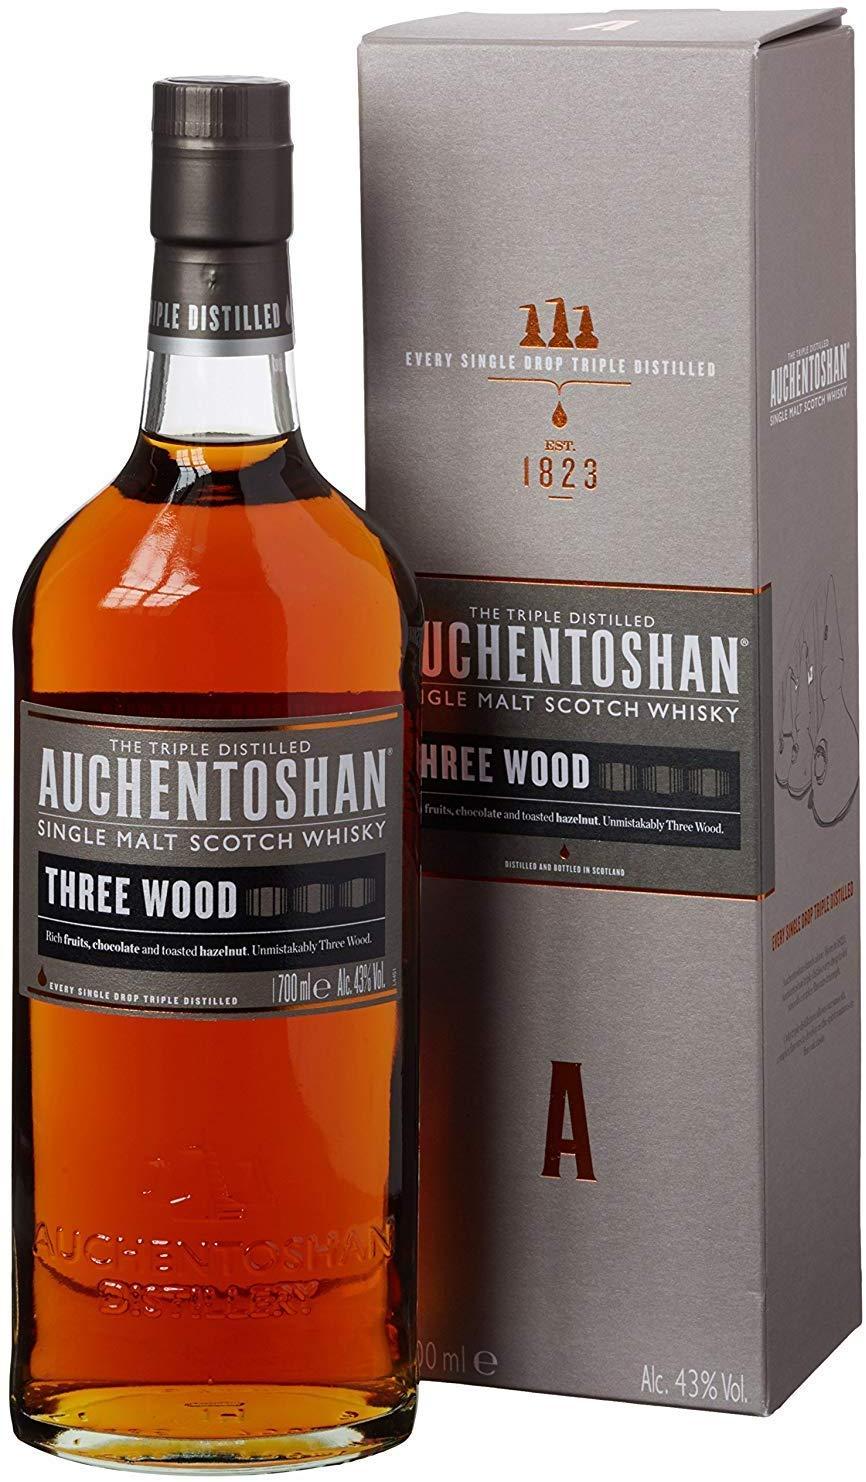 Save upto 41% on this award winning Auchentoshan Single Malt Whisky - £27.50 @ Amazon